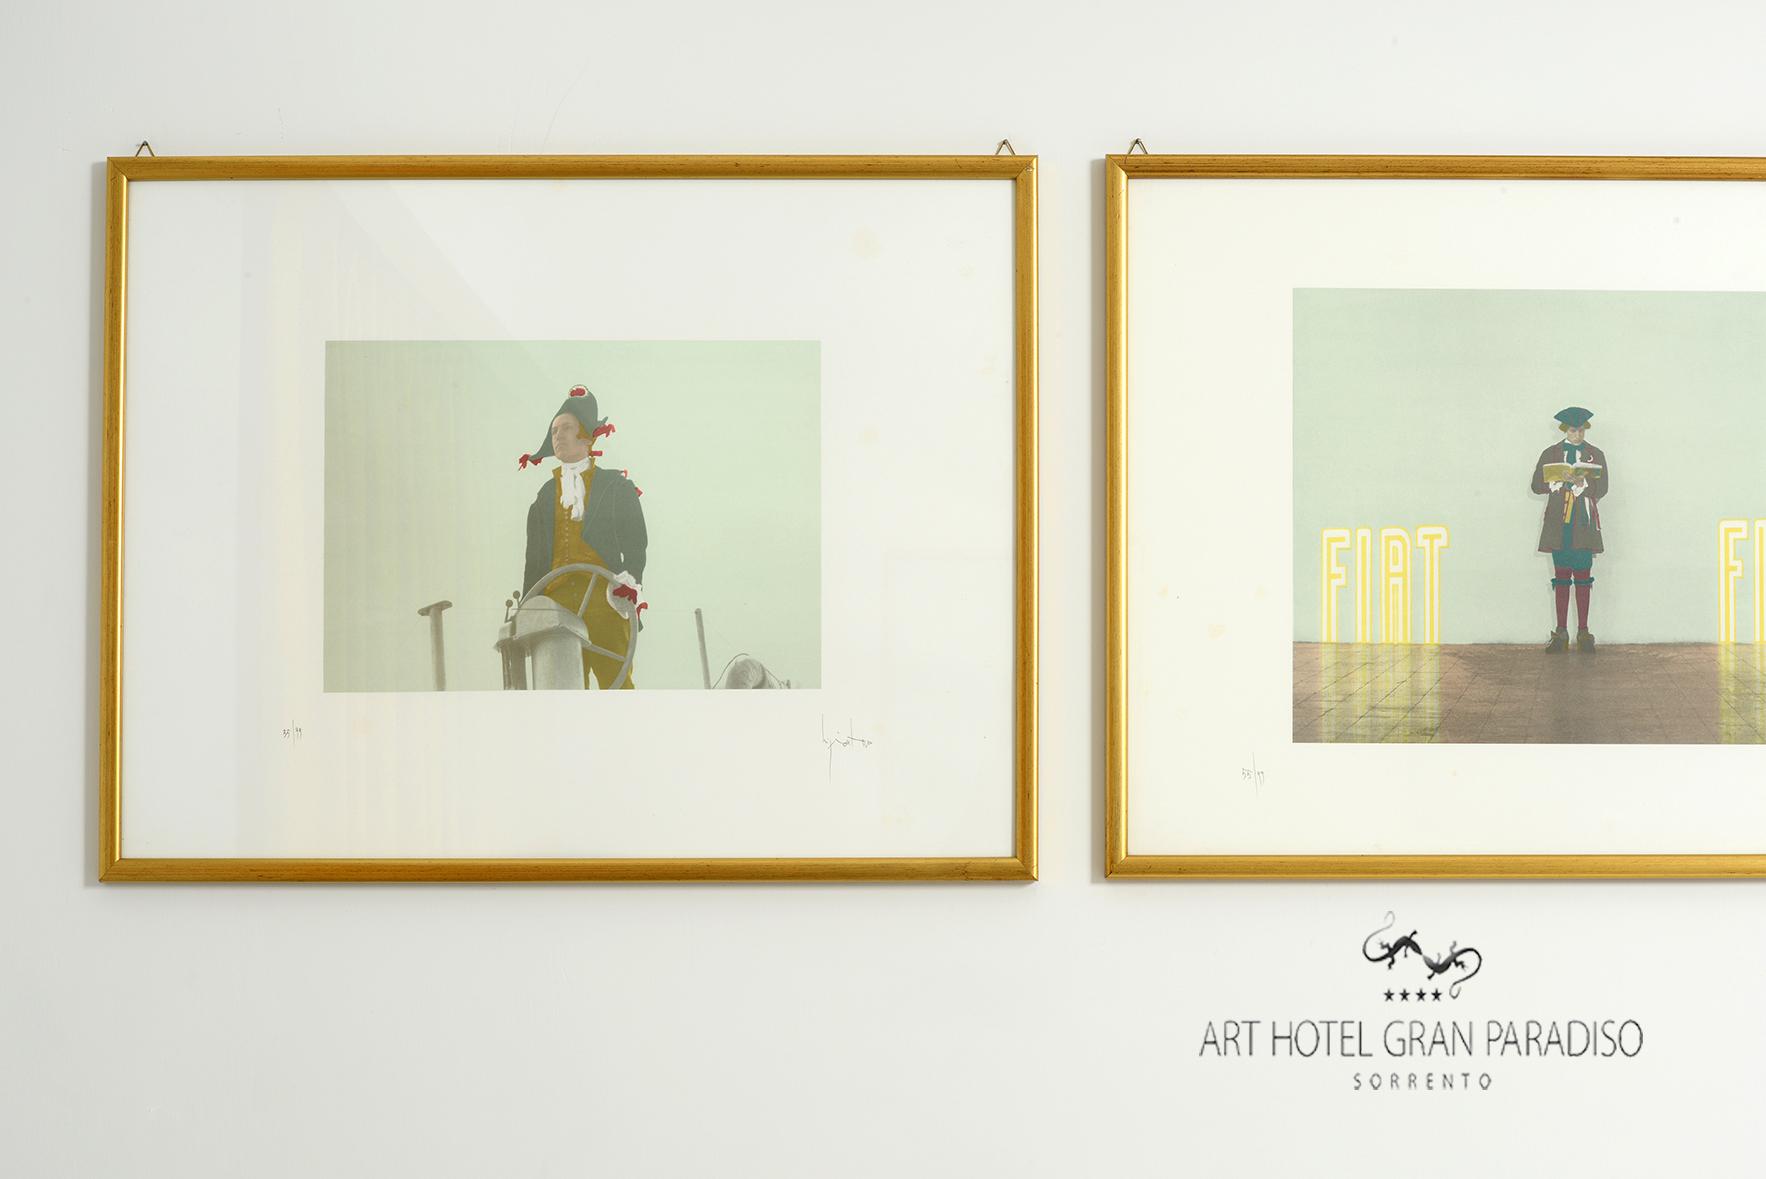 Art_Hotel_Gran_Paradiso_2013_411_Luigi_Ontani_11.jpg